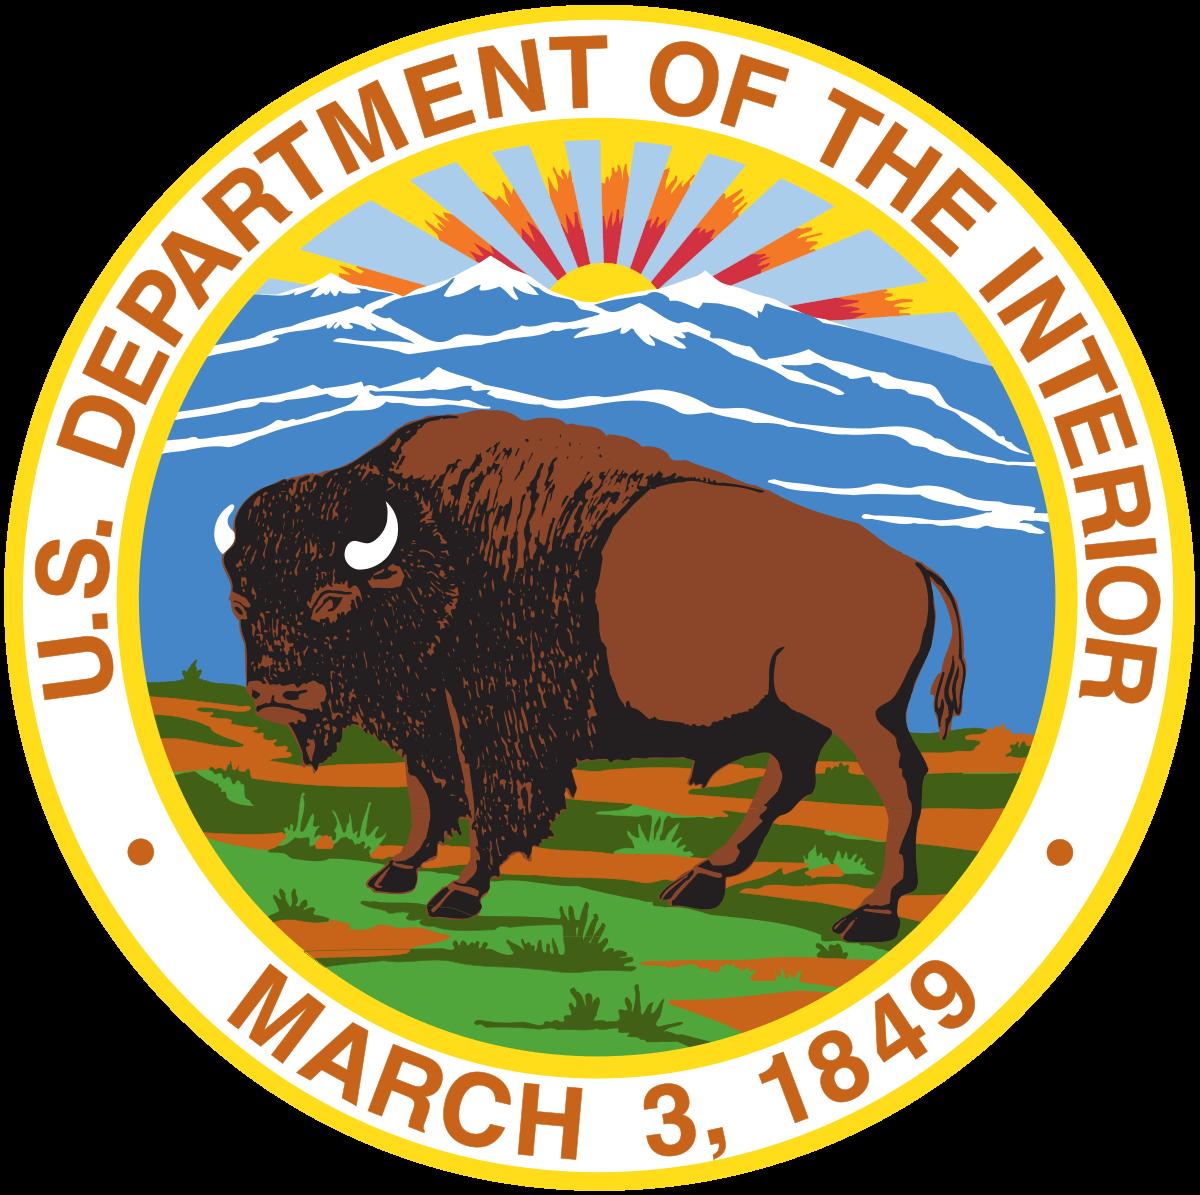 अमेरिकी आंतरिक विभाग